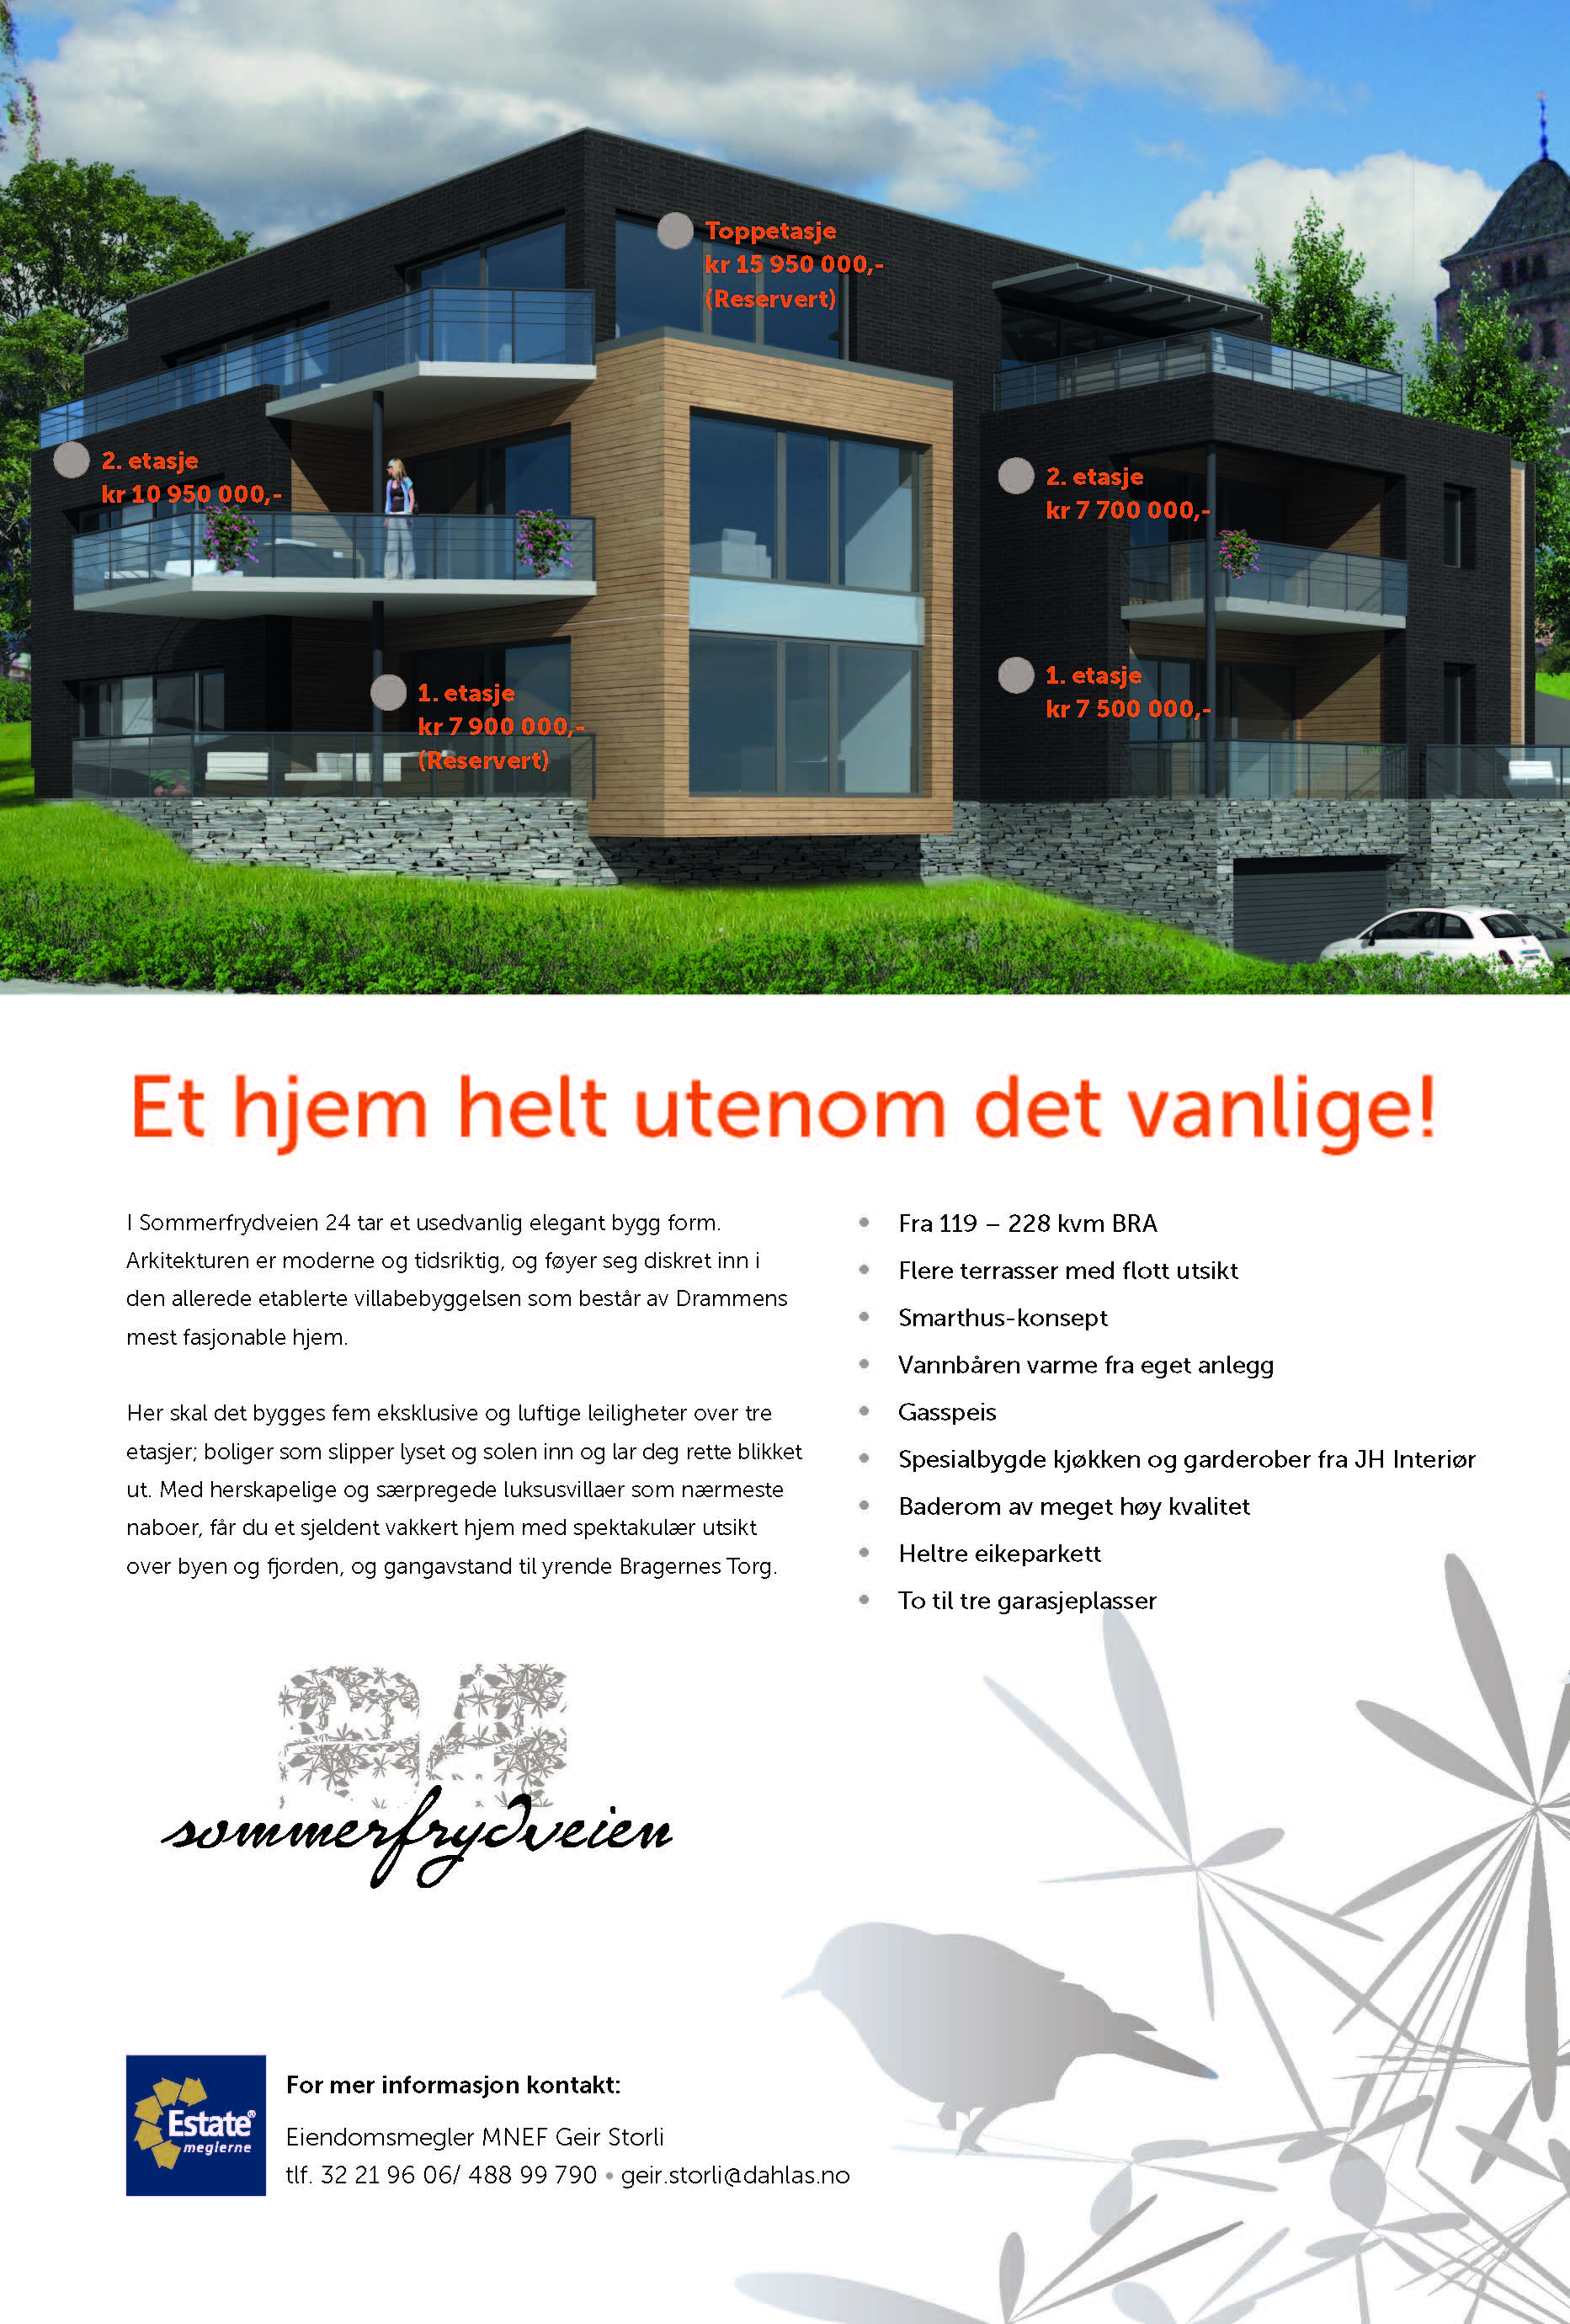 Boligprosjekt for Dahl AS Drammen